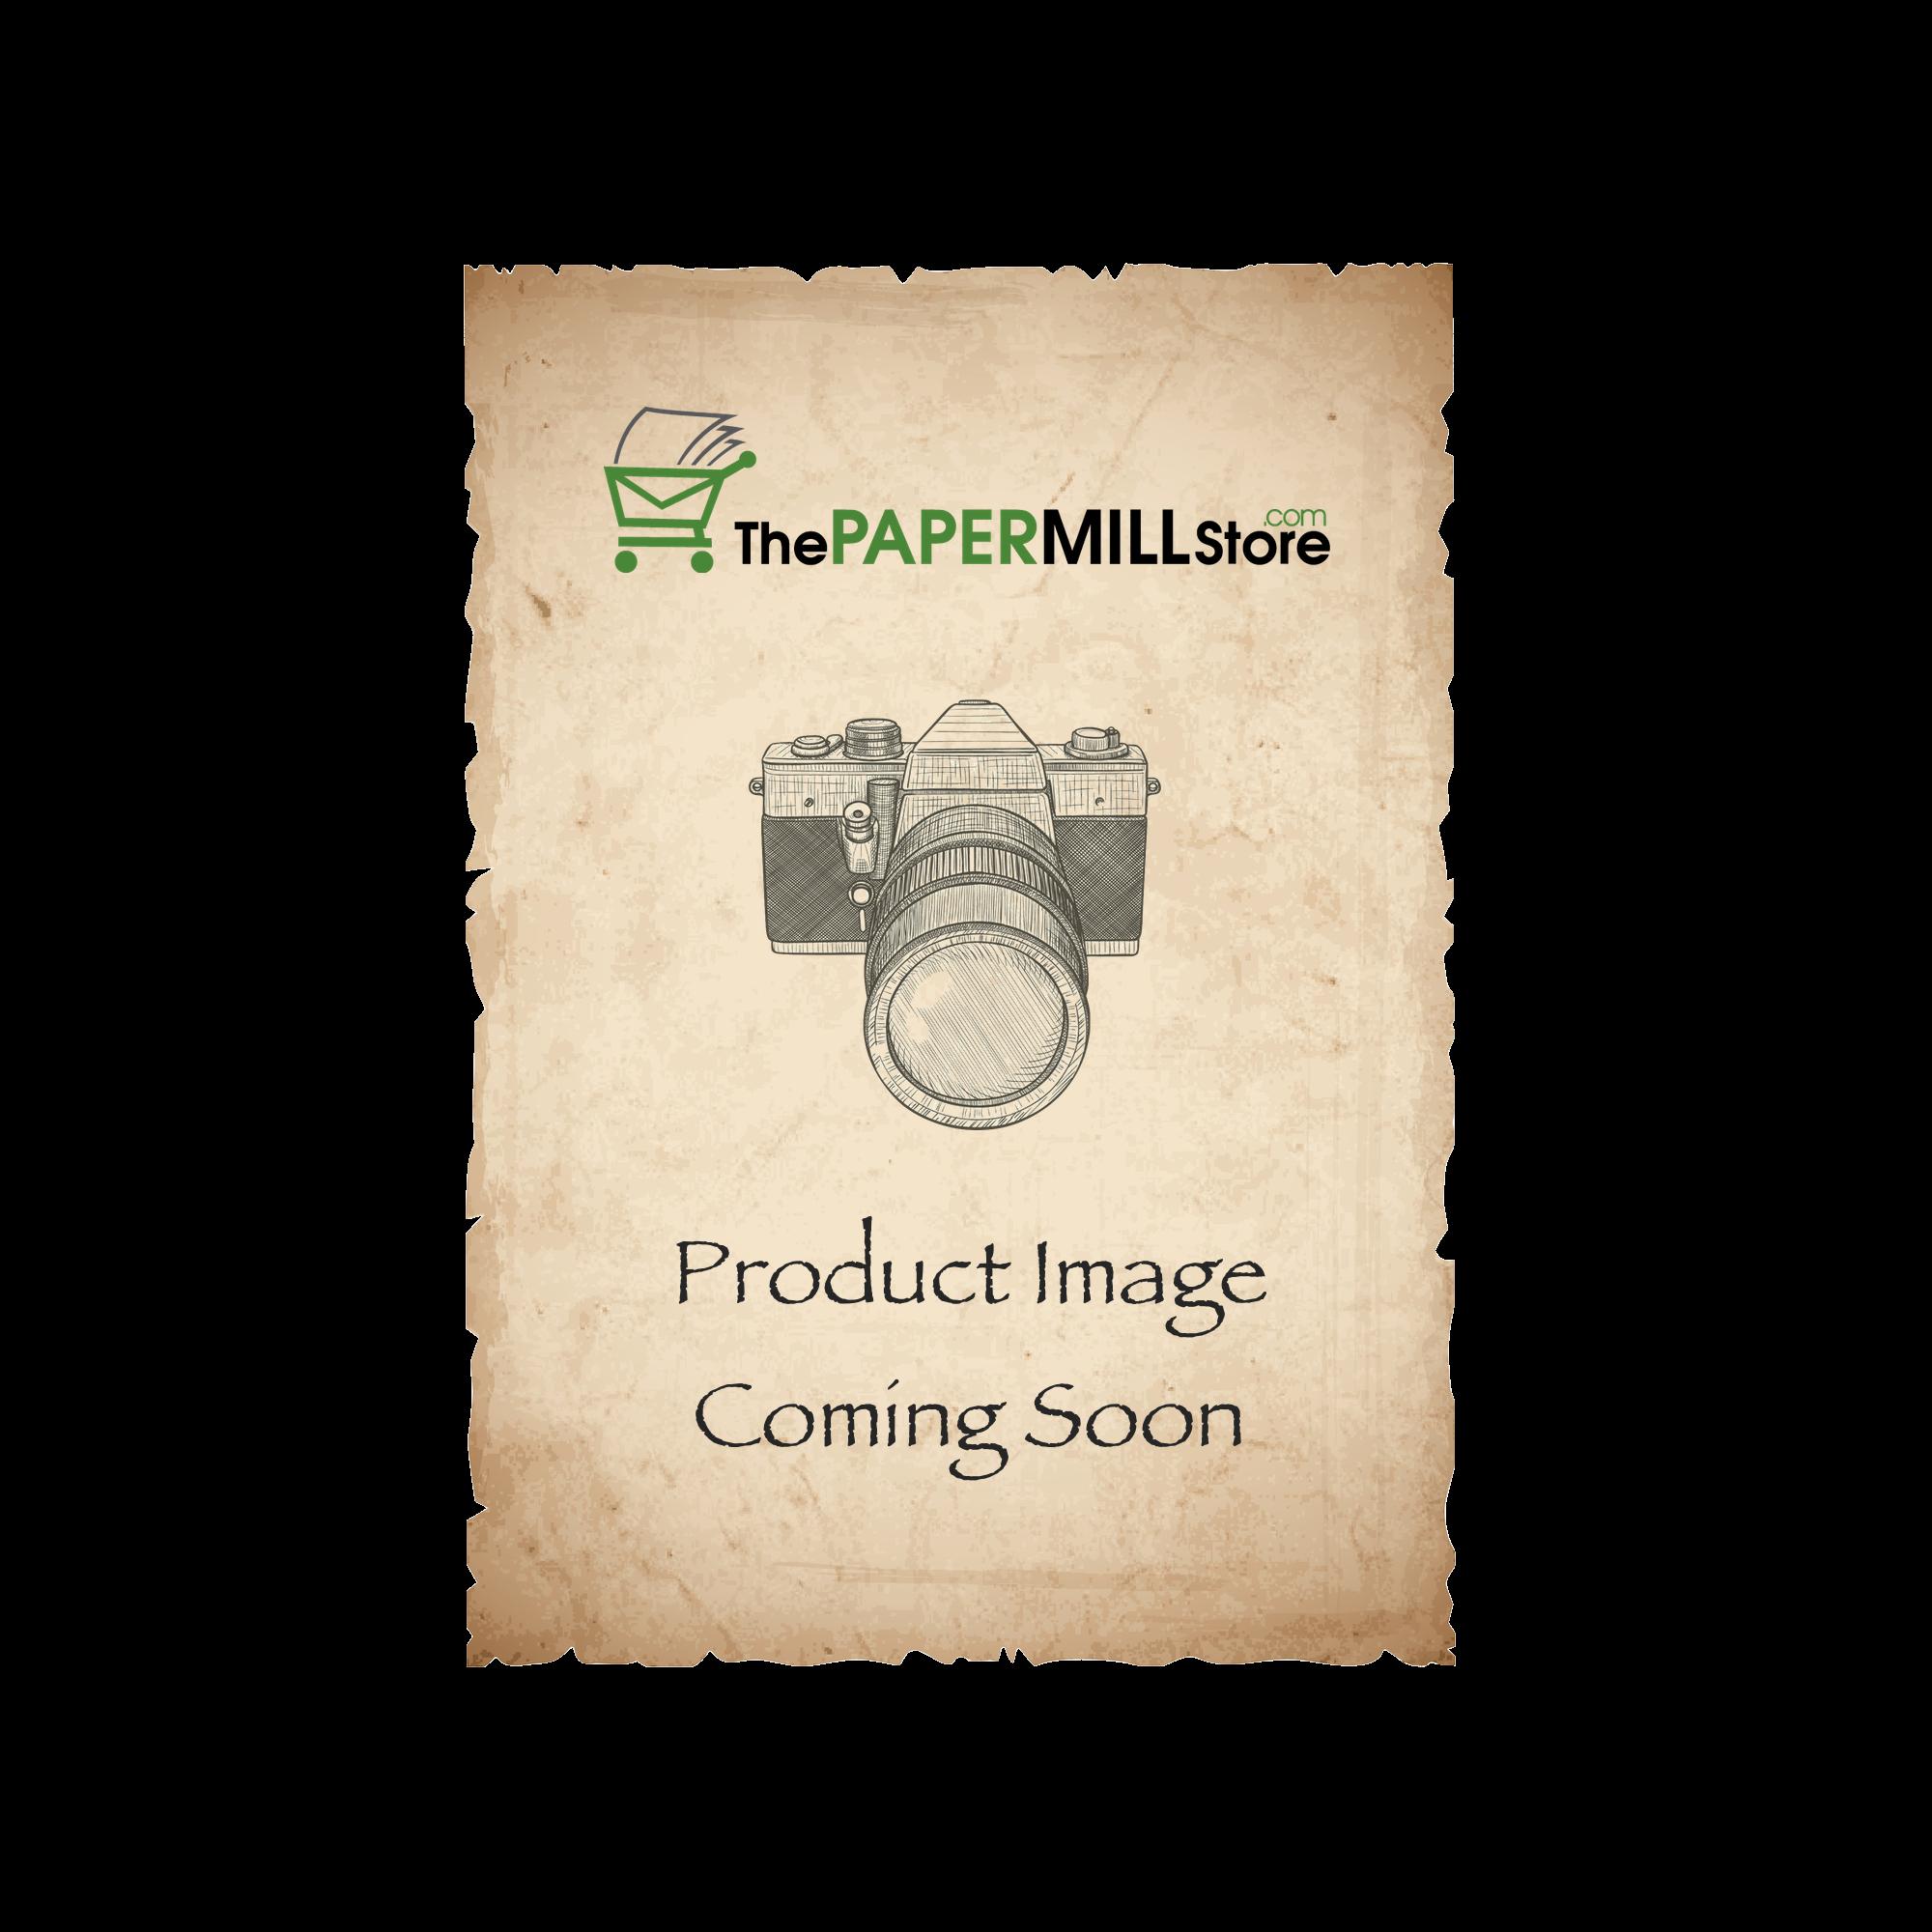 Printmaster Brown Kraft Envelopes - No. 10 1/2 Catalog (9 x 12) 28 lb Writing 500 per Carton